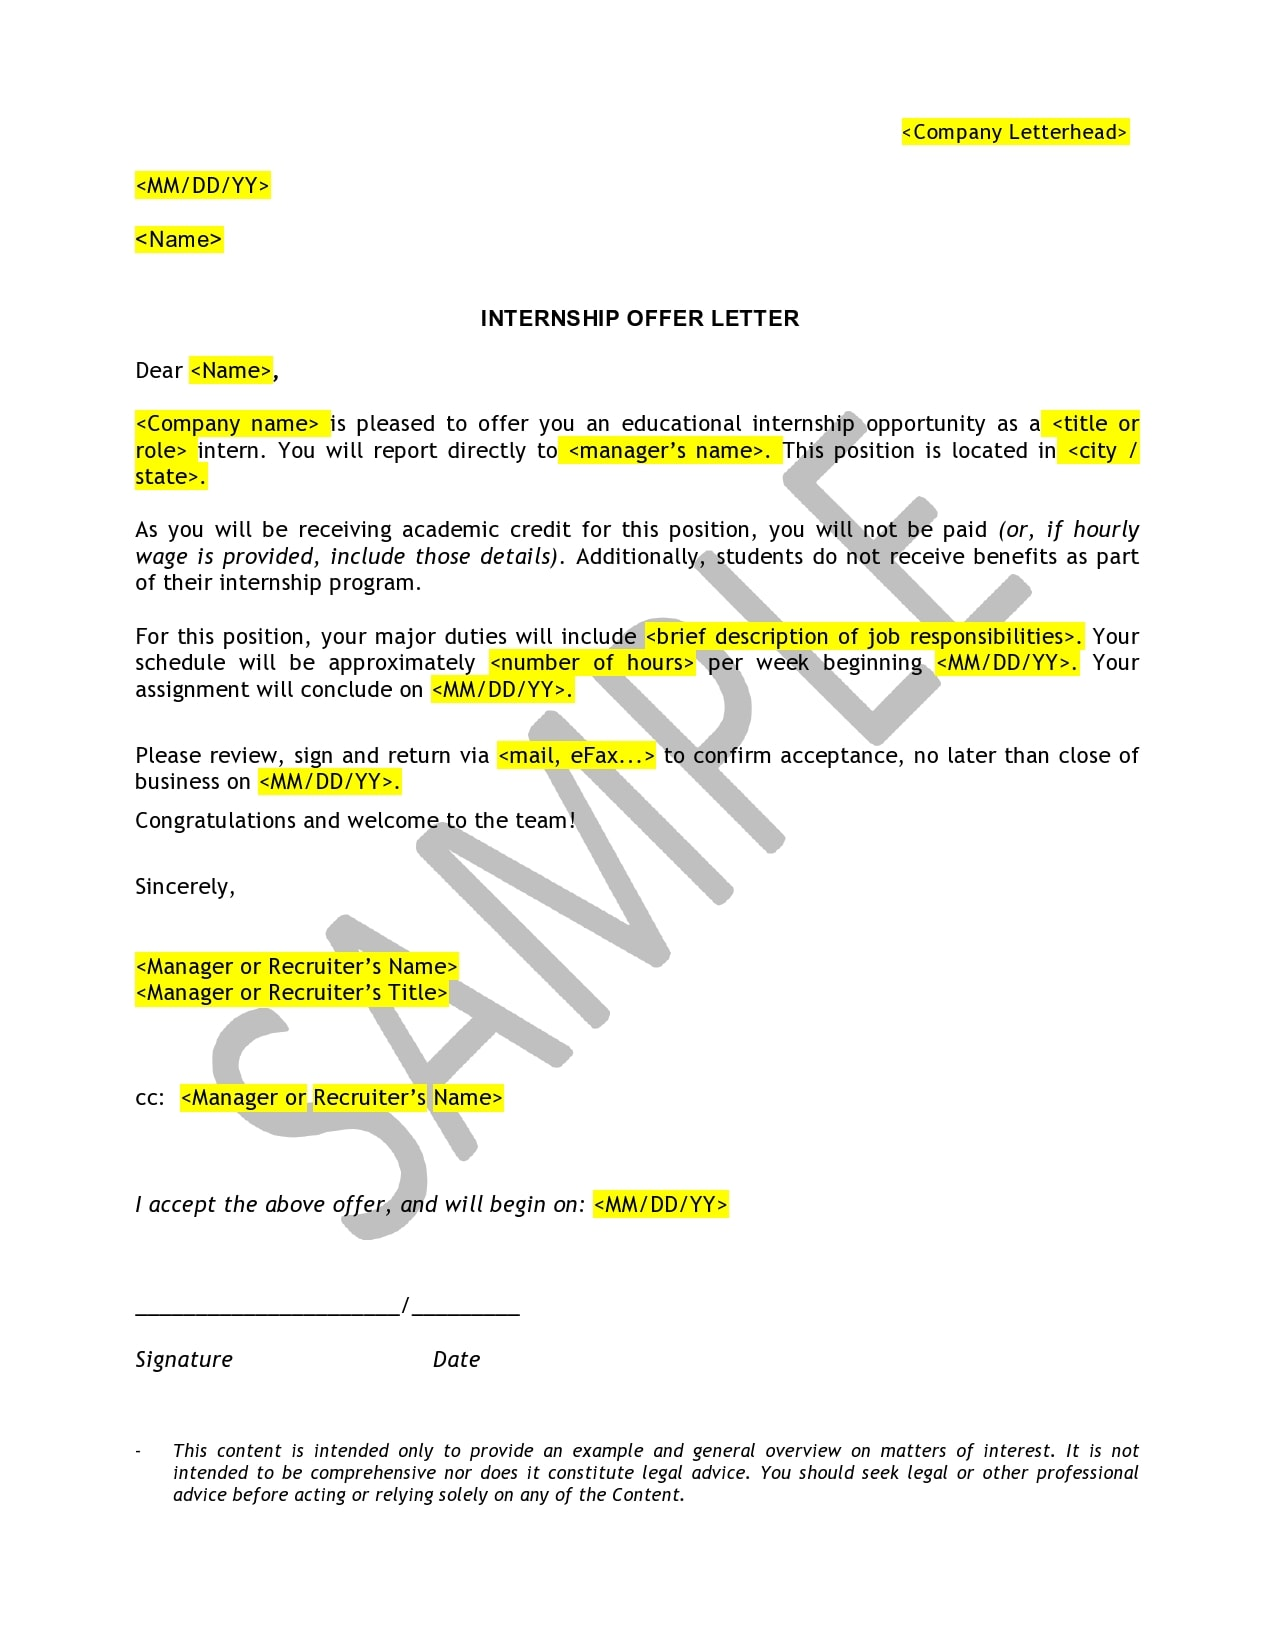 internship offer letter 03